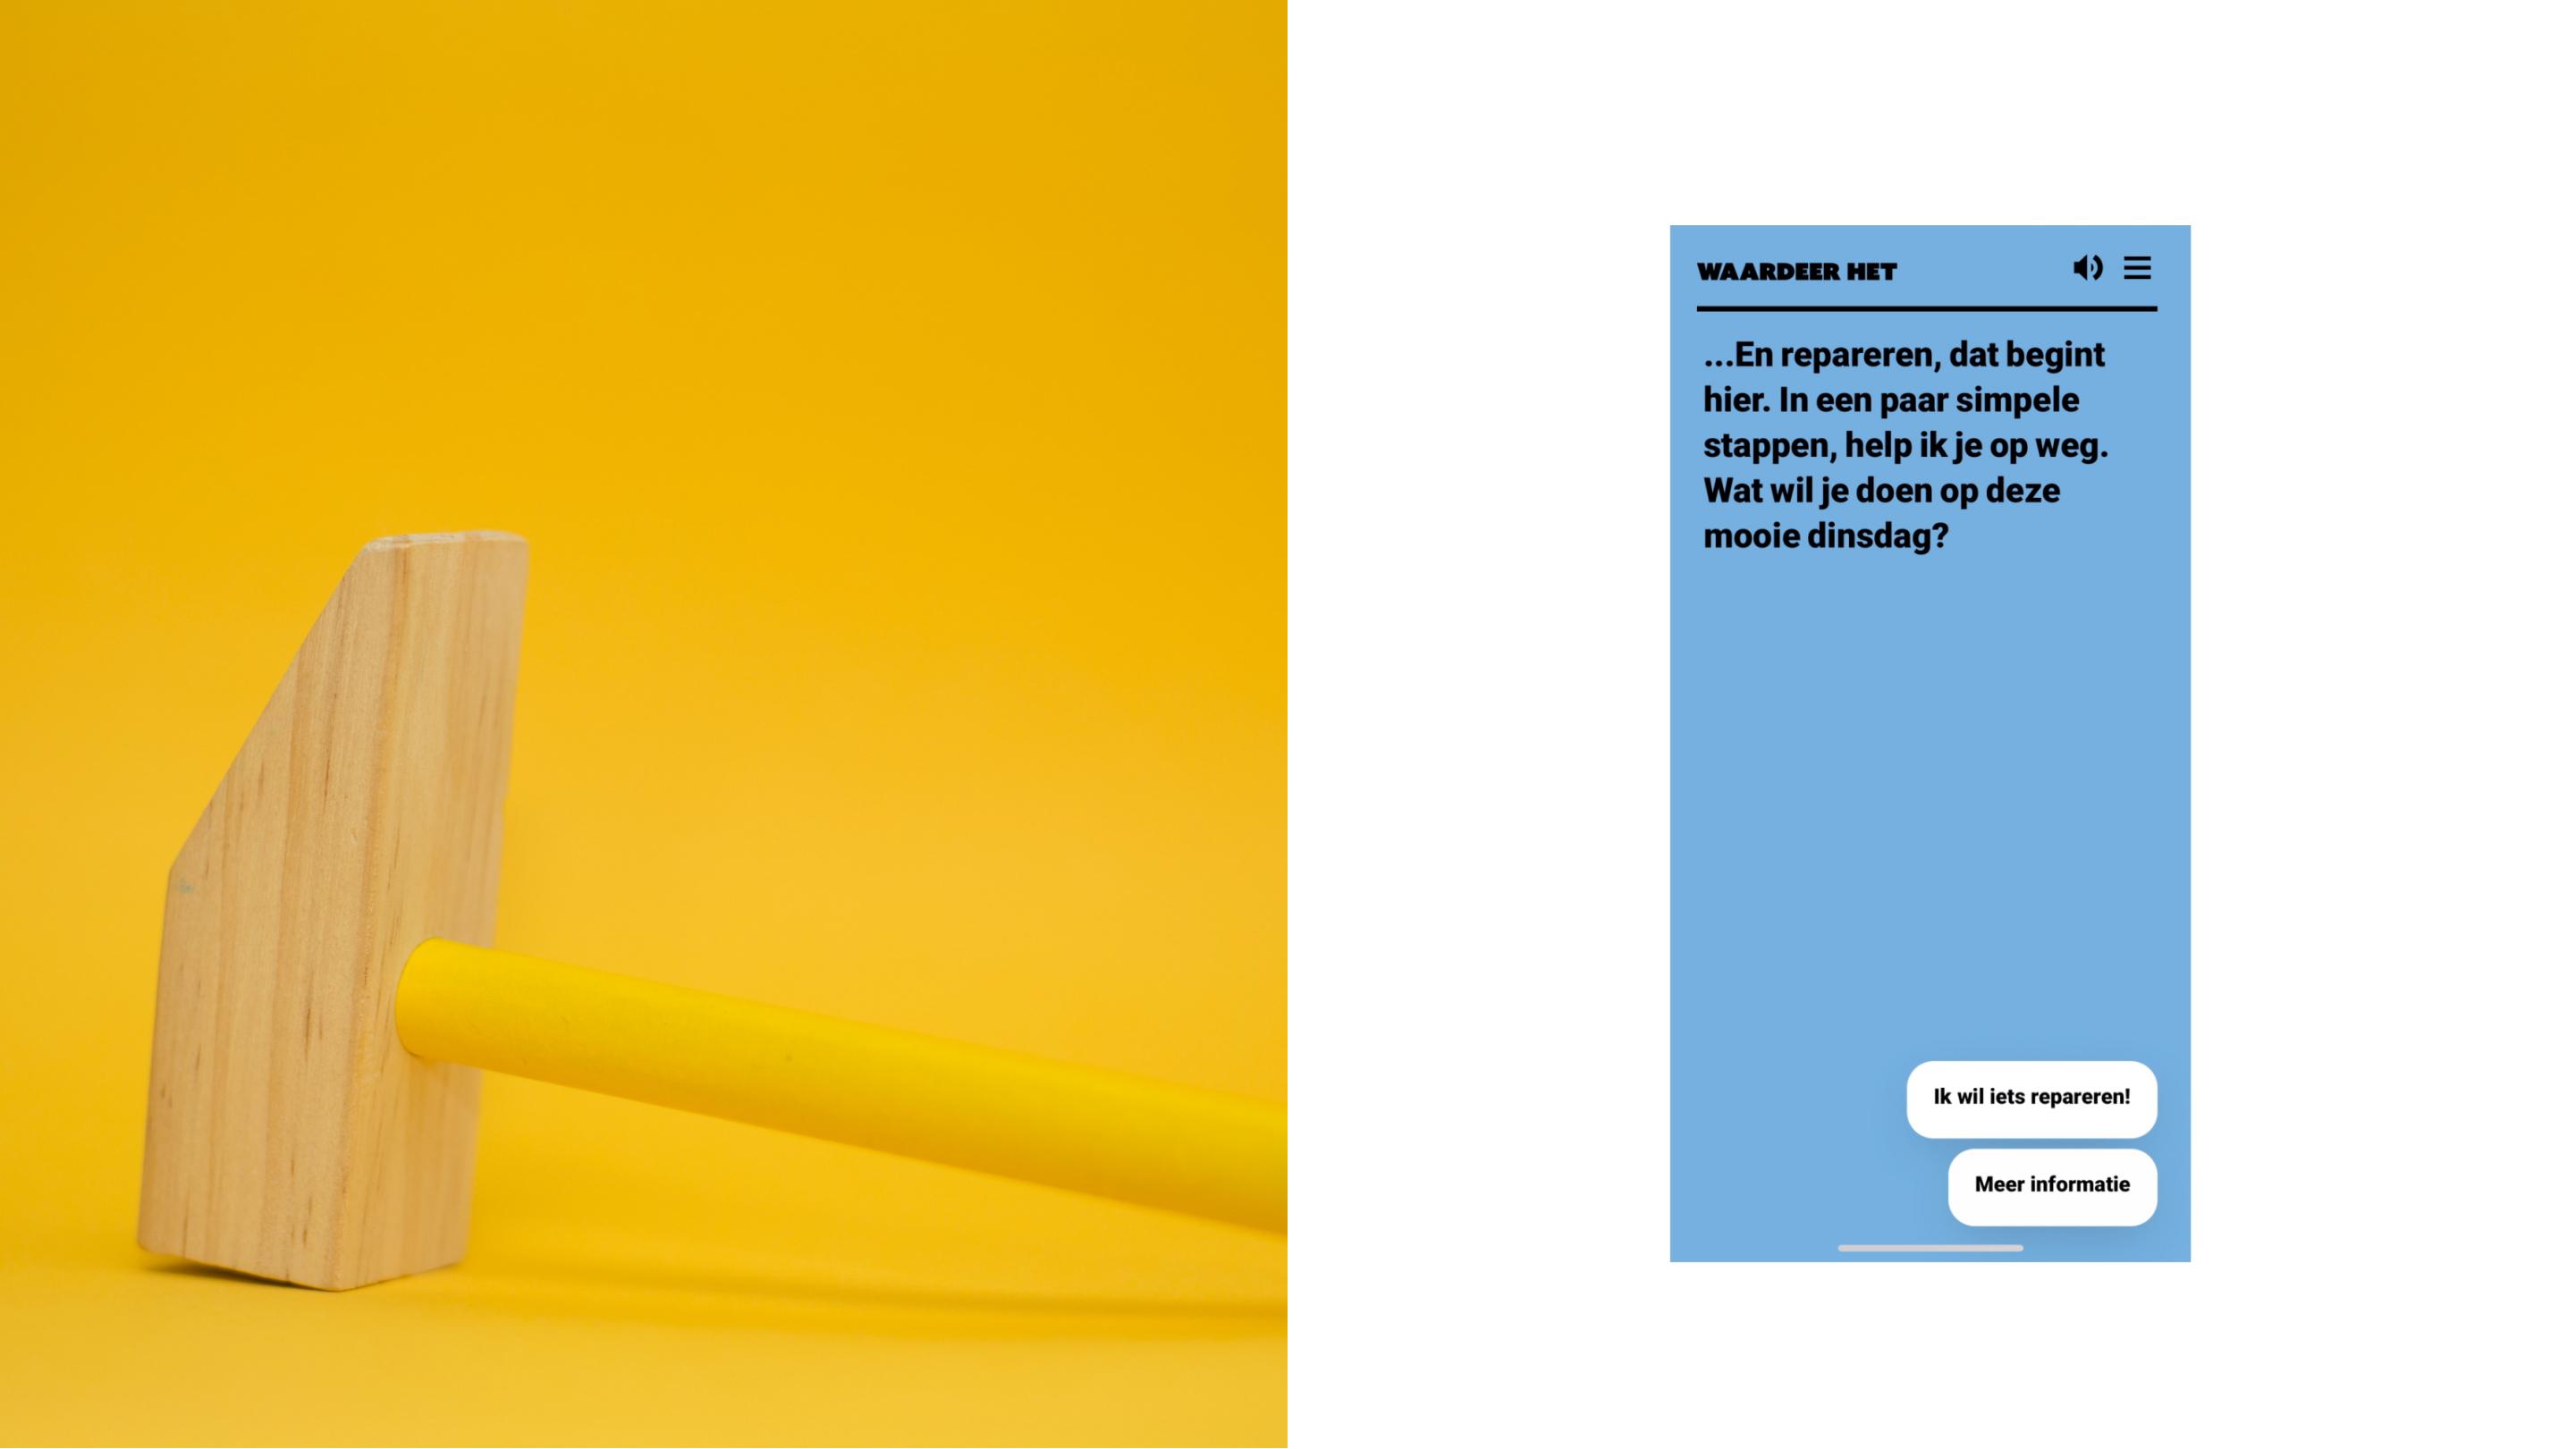 sire yellow image